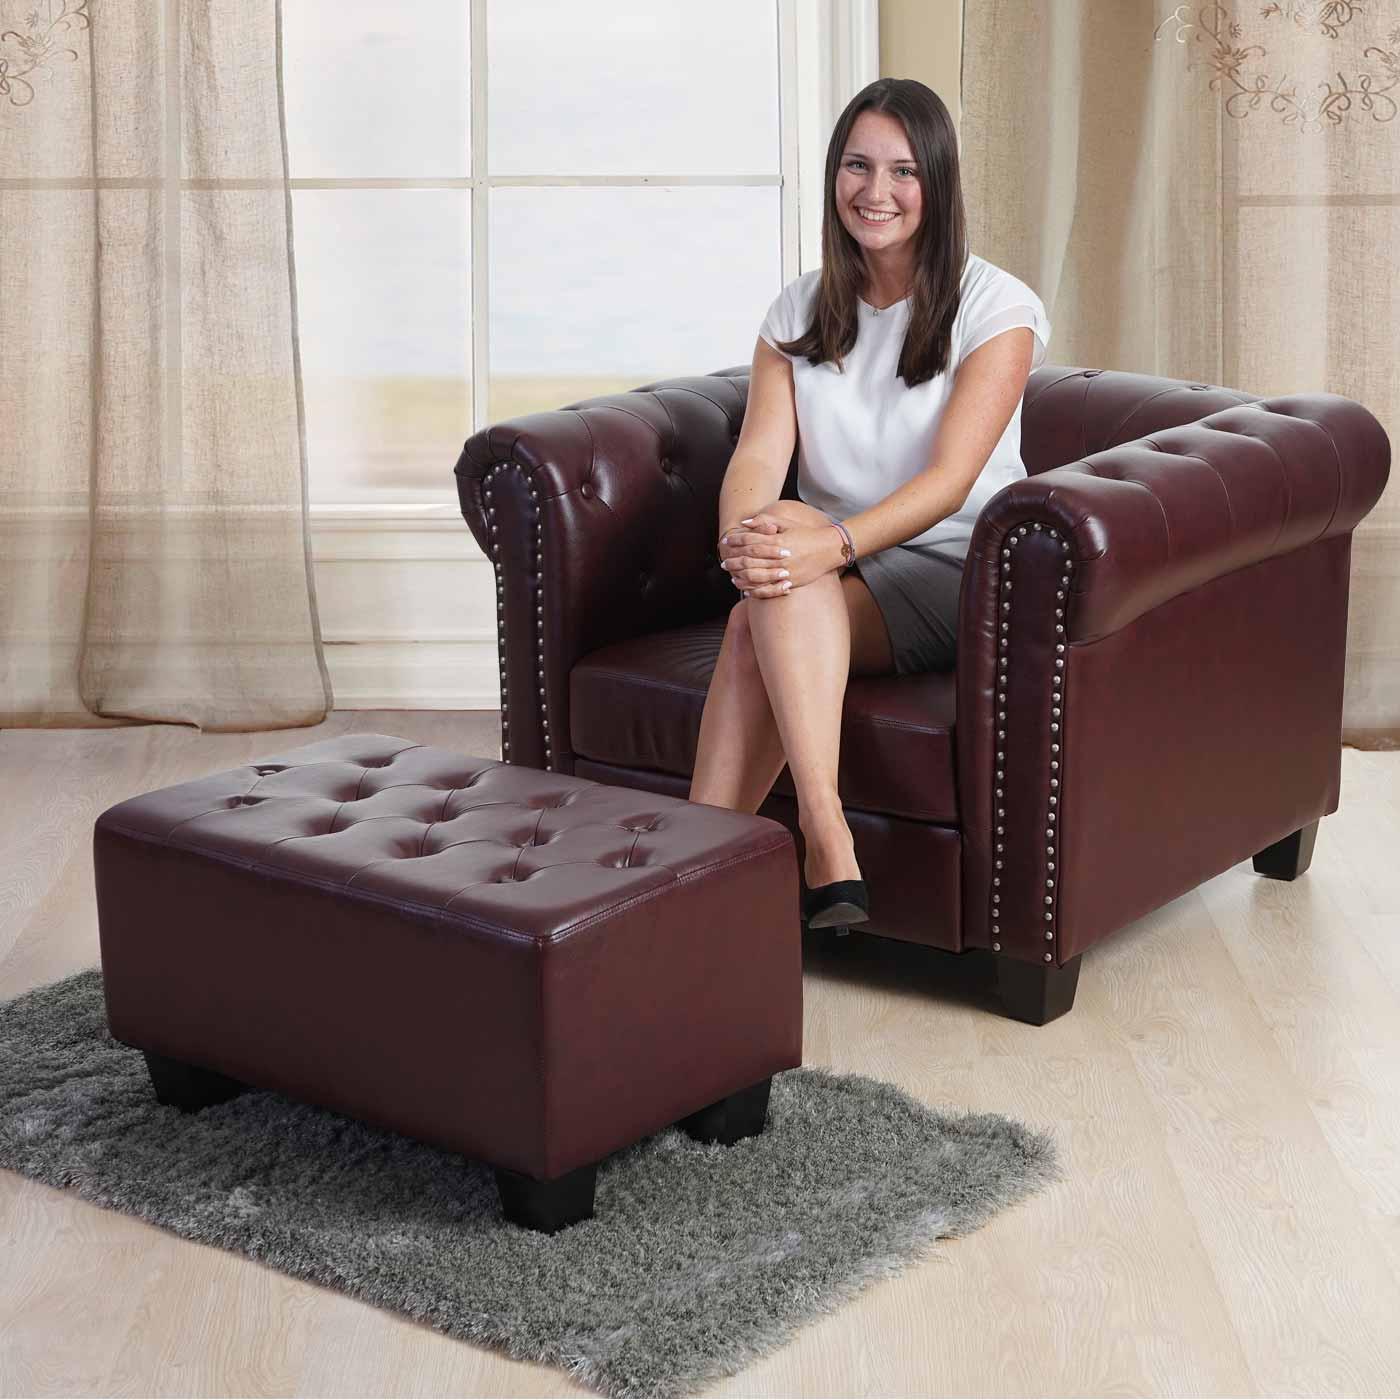 luxus 3 2 1 sofagarnitur couchgarnitur loungesofa chesterfield kunstleder eckige f e rot braun. Black Bedroom Furniture Sets. Home Design Ideas